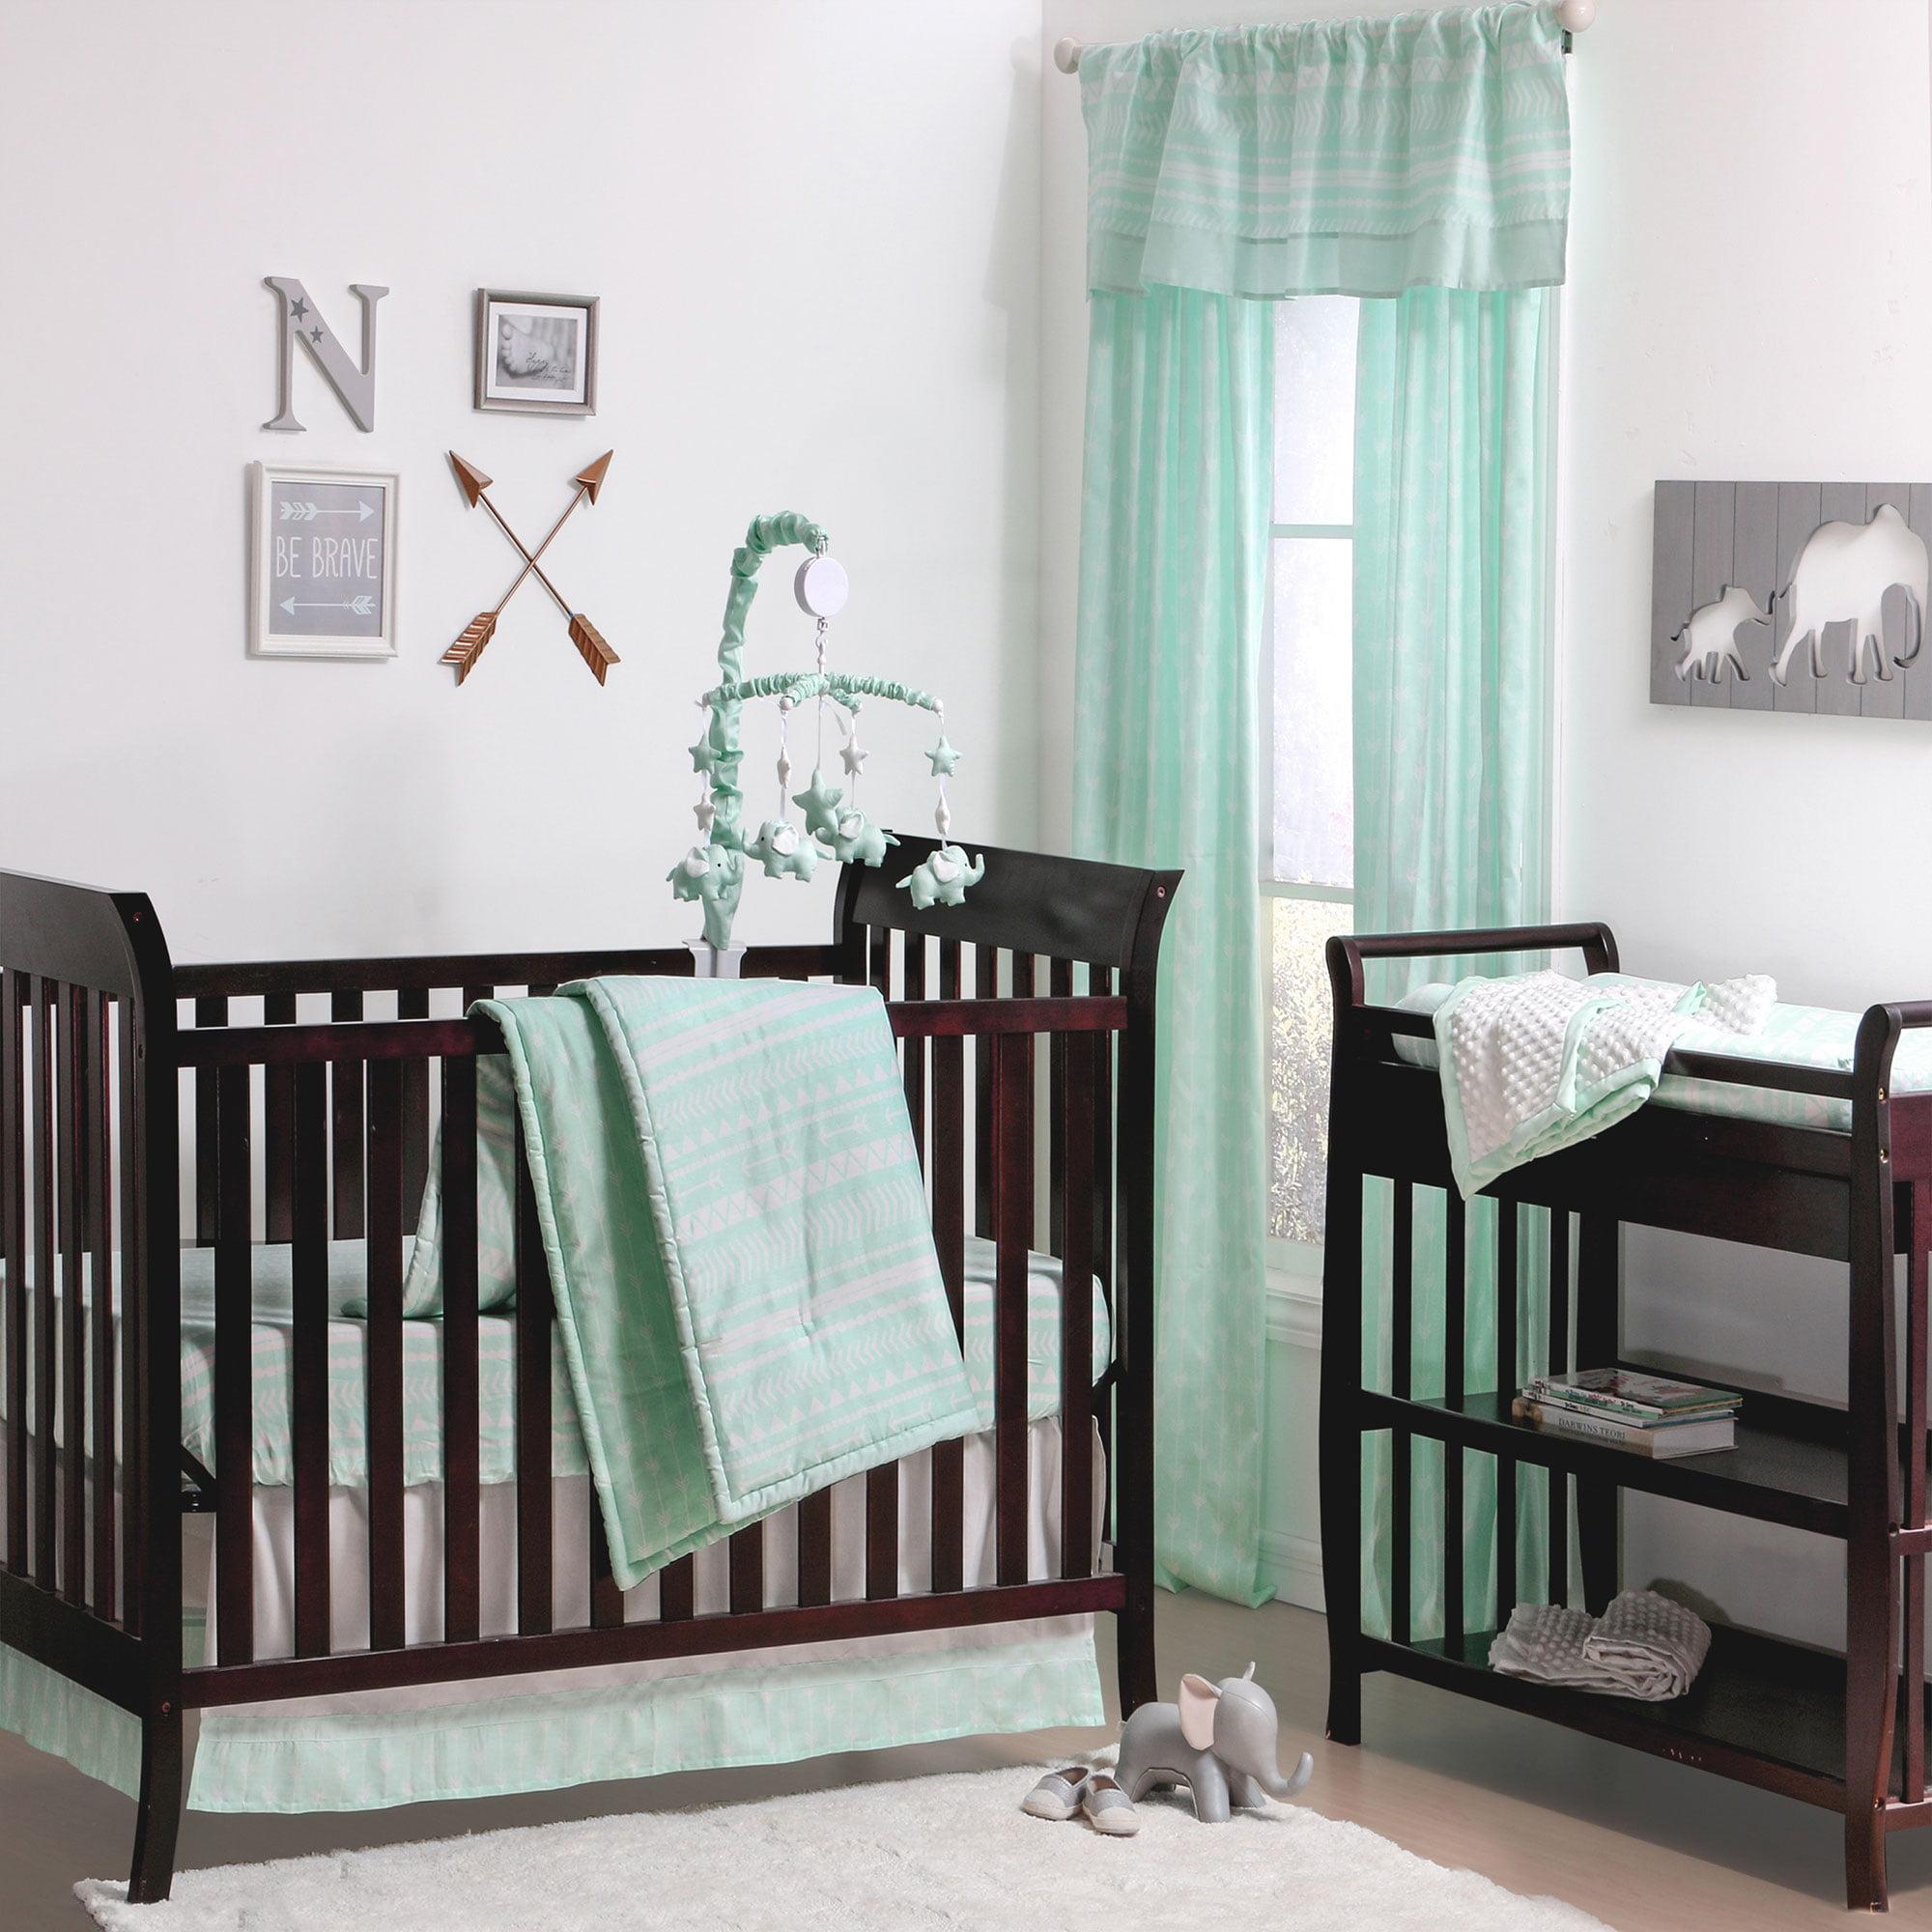 The Peanut Shell 3 Piece Baby Crib Bedding Set Mint Green Tribal Print Geometric 100 Cotton Quilt Skirt And Sheet